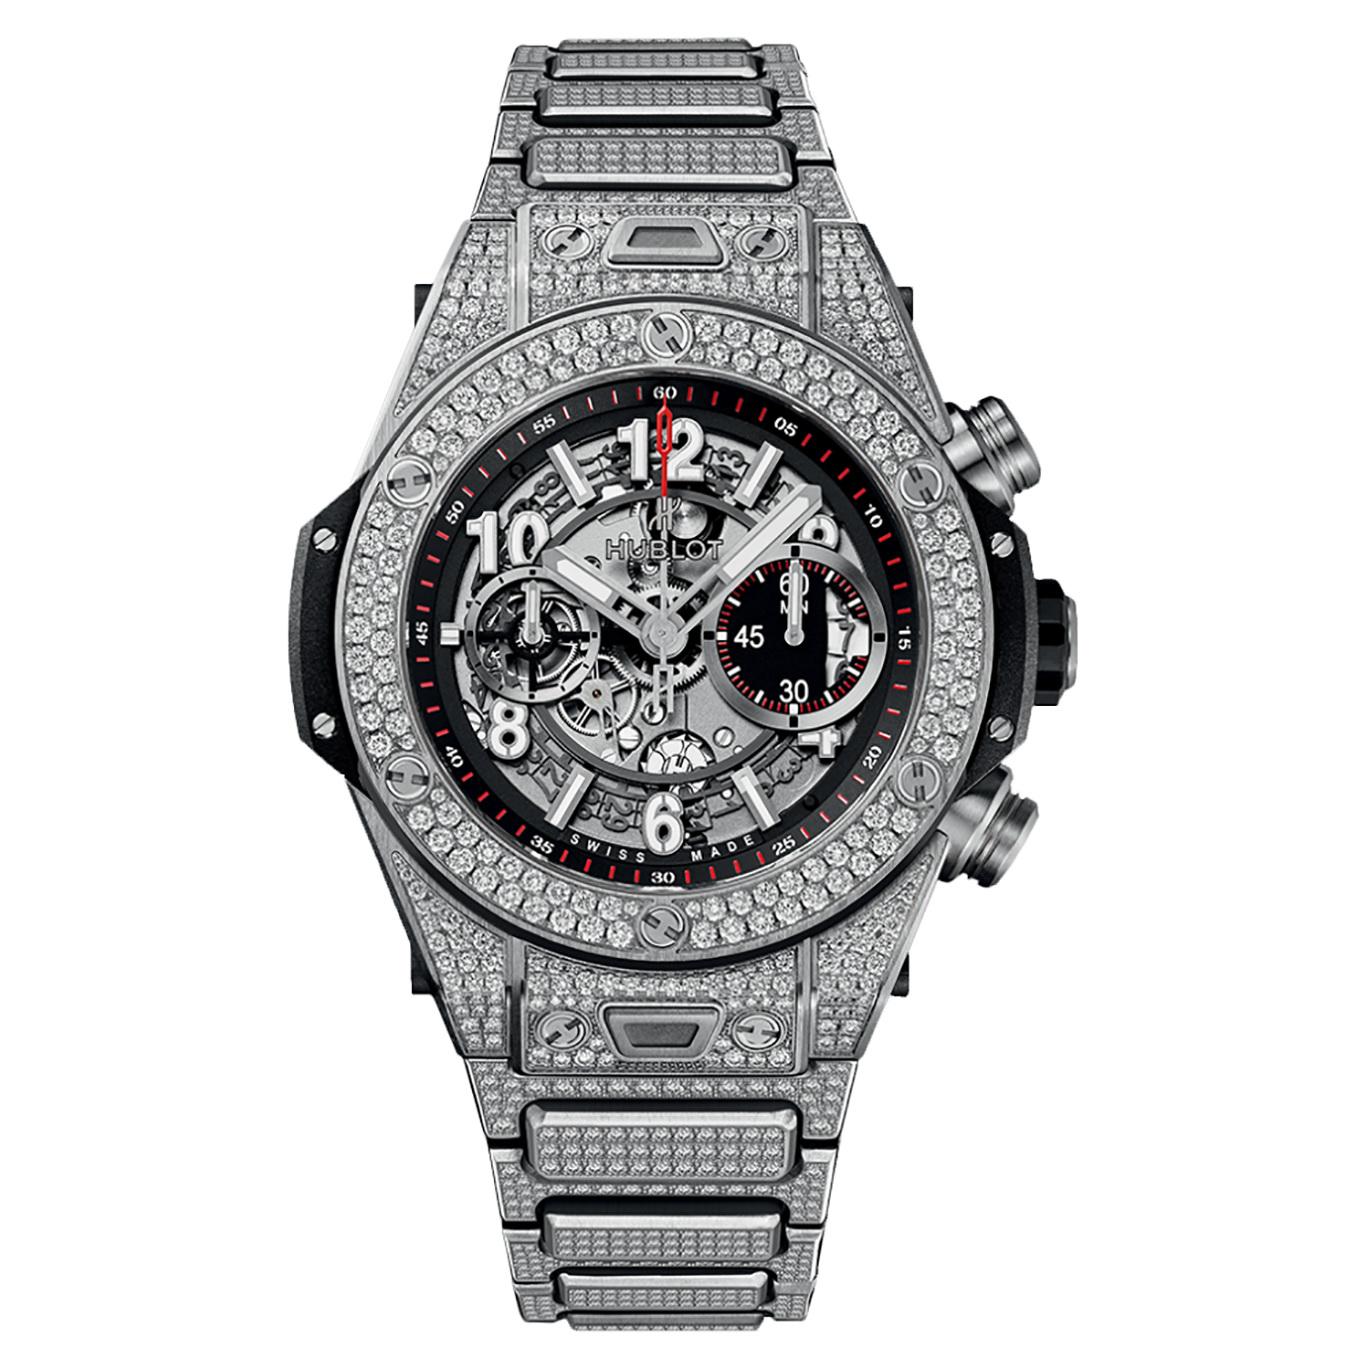 Big Bang Unico Titanium Pavé Bracelet 411.NX.1170.NX.3704